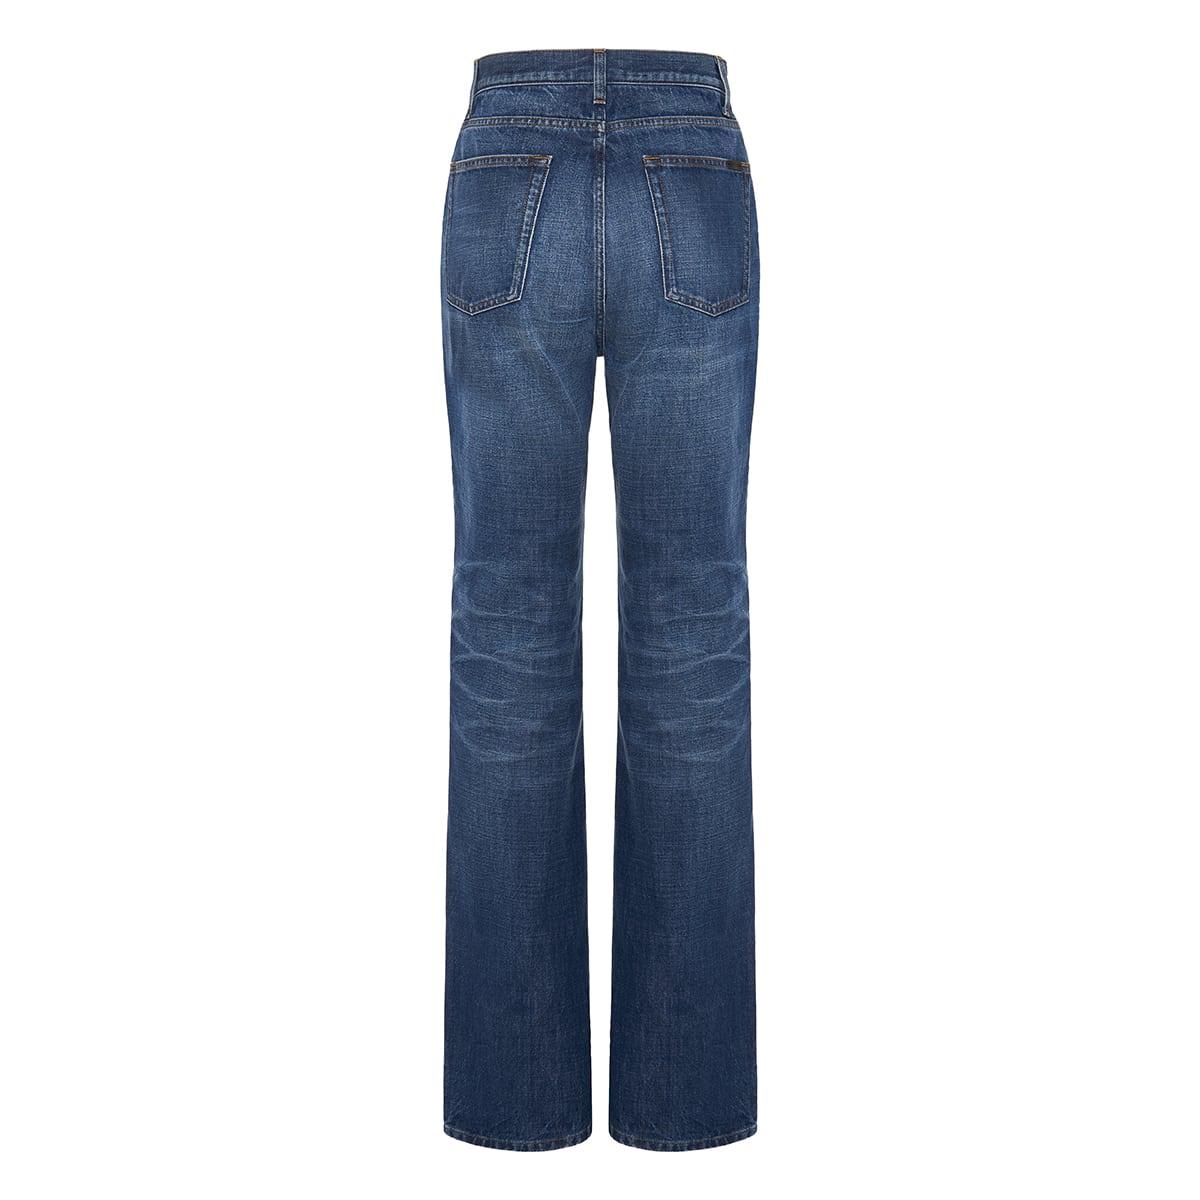 90's high-waist flared jeans